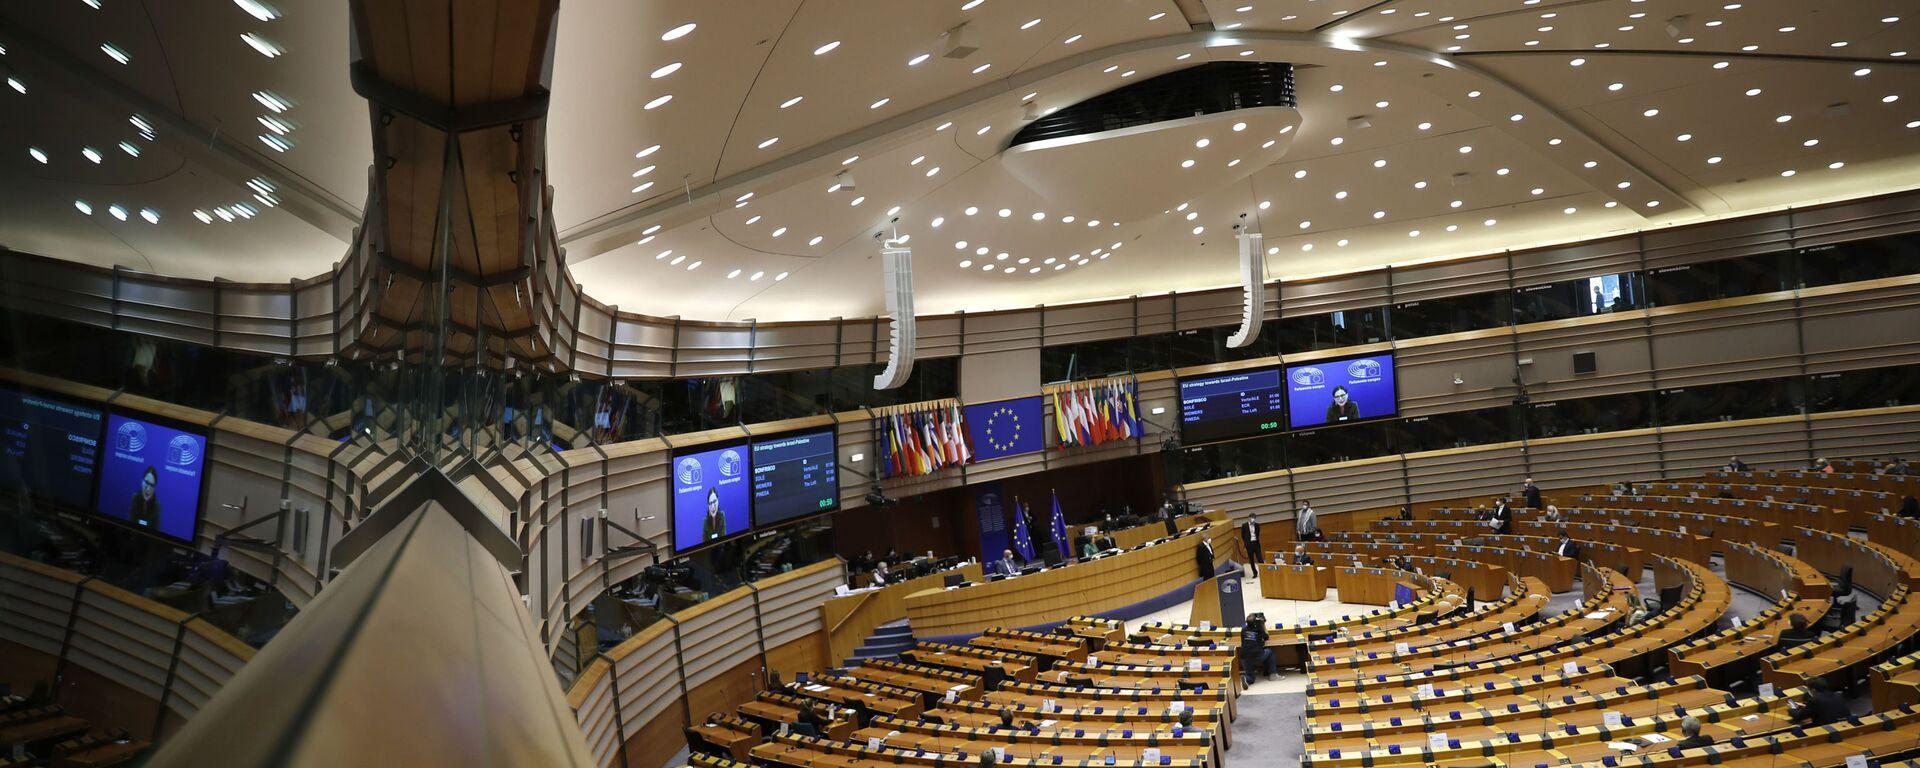 Zasedanje Evropskog parlamenta u Briselu - Sputnik Srbija, 1920, 16.09.2021